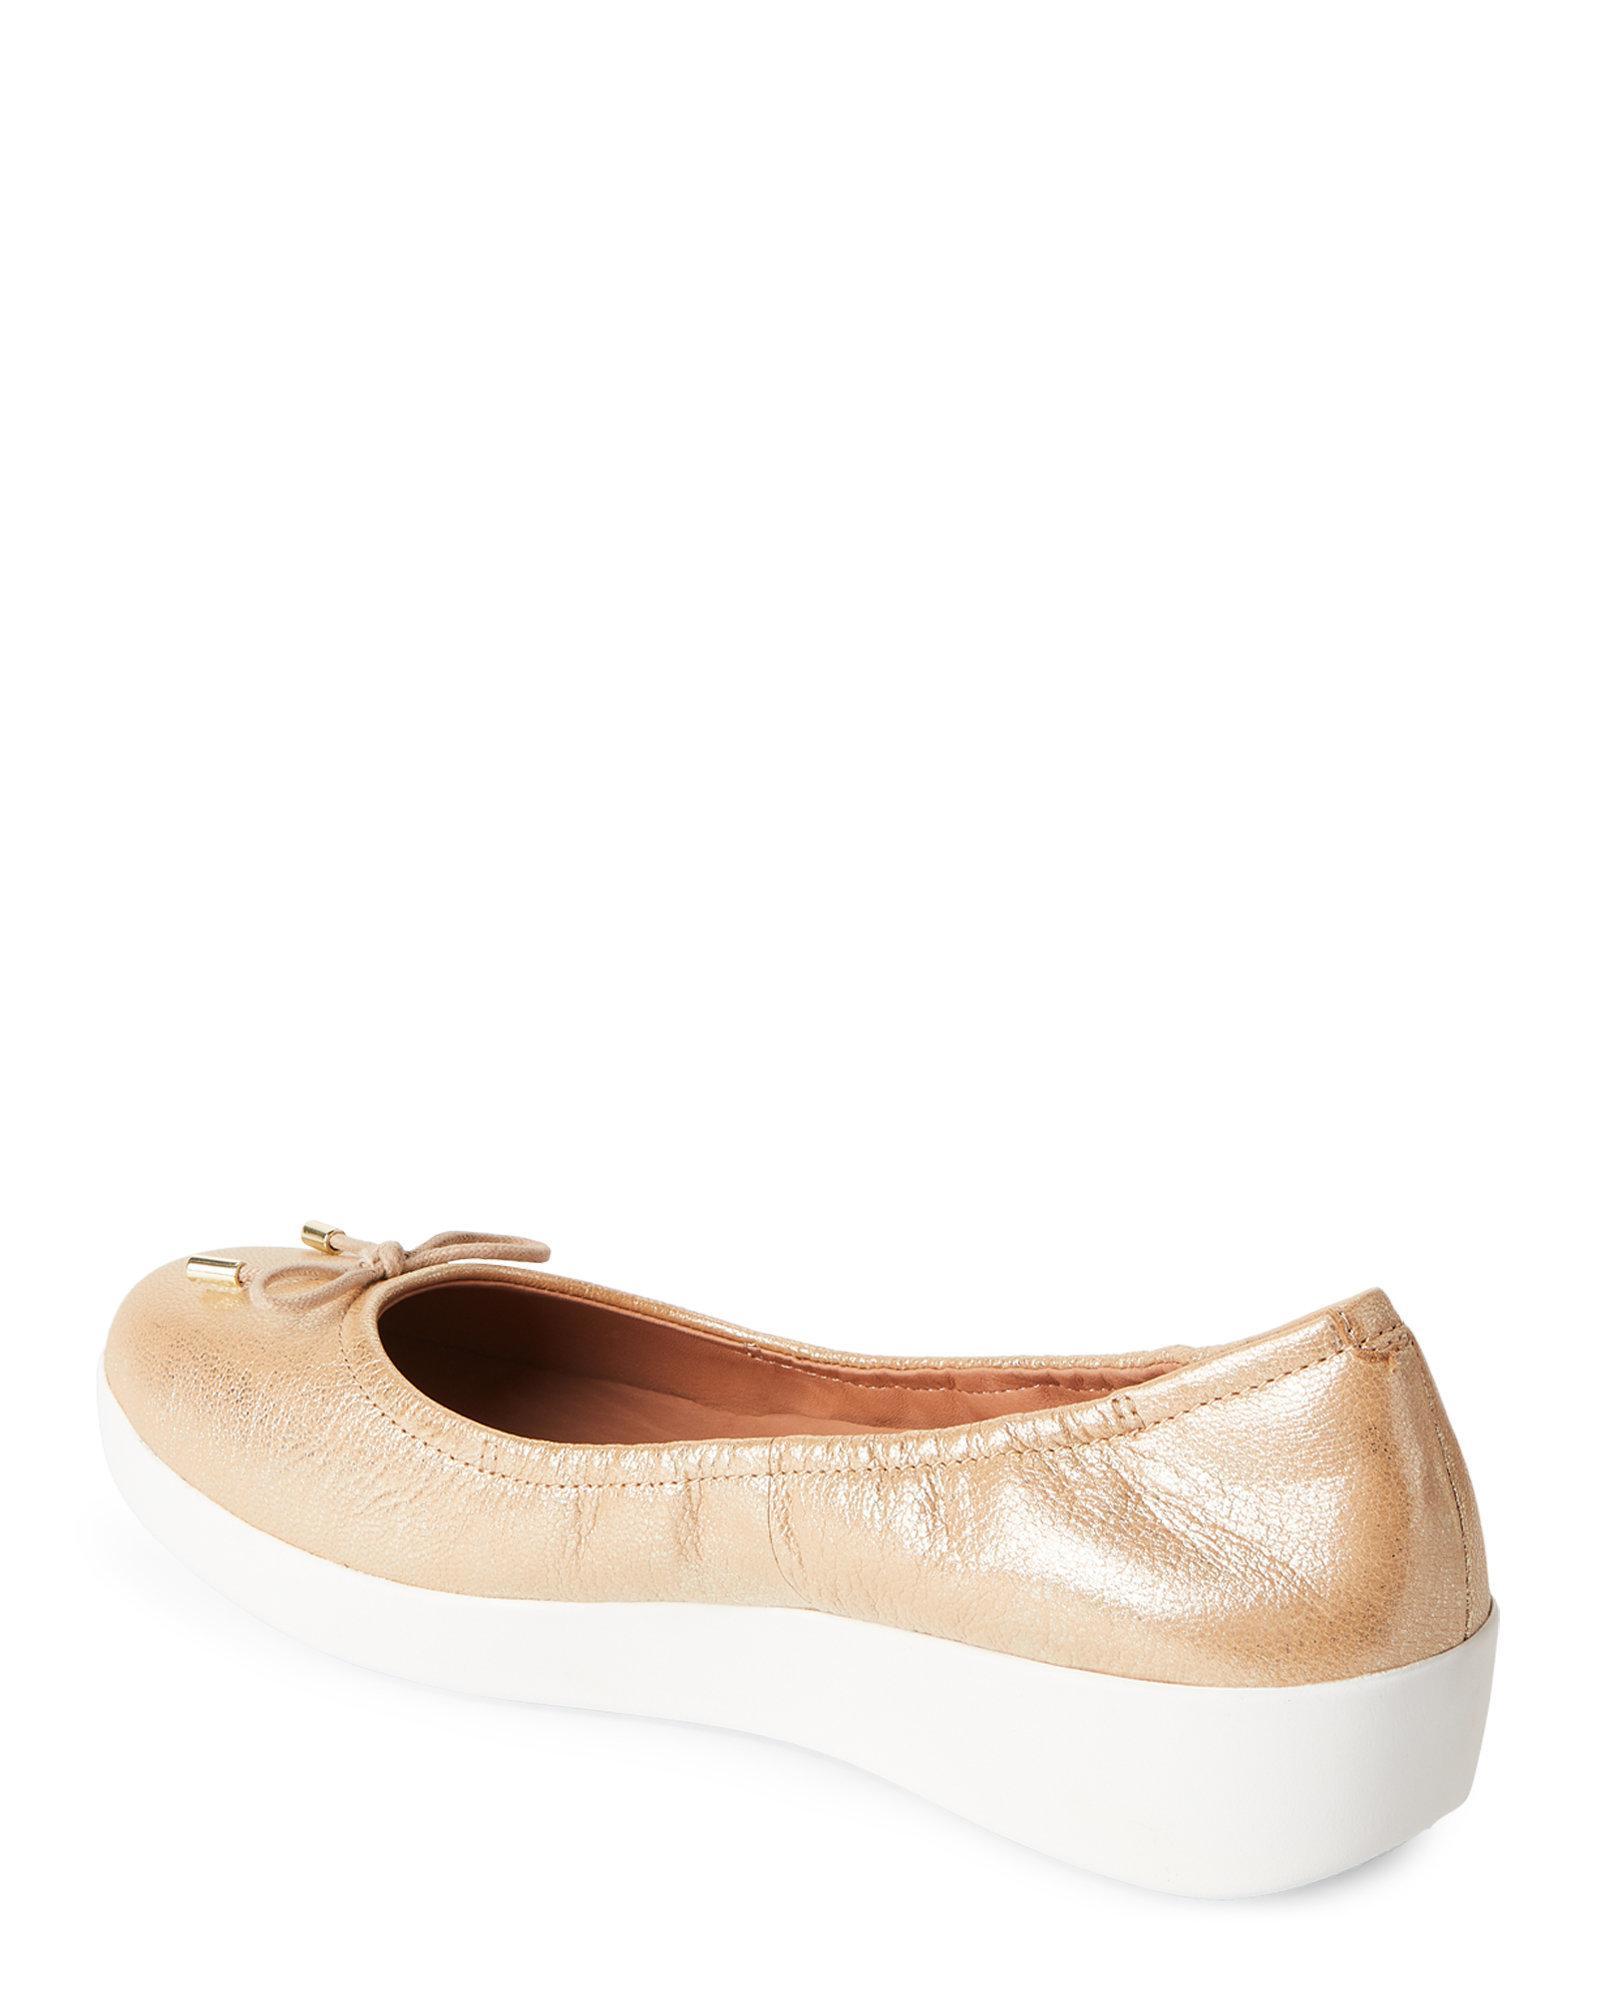 73db88848098 Lyst - Fitflop Gold Superbendy Ballerina Demi Wedge Flats in Metallic